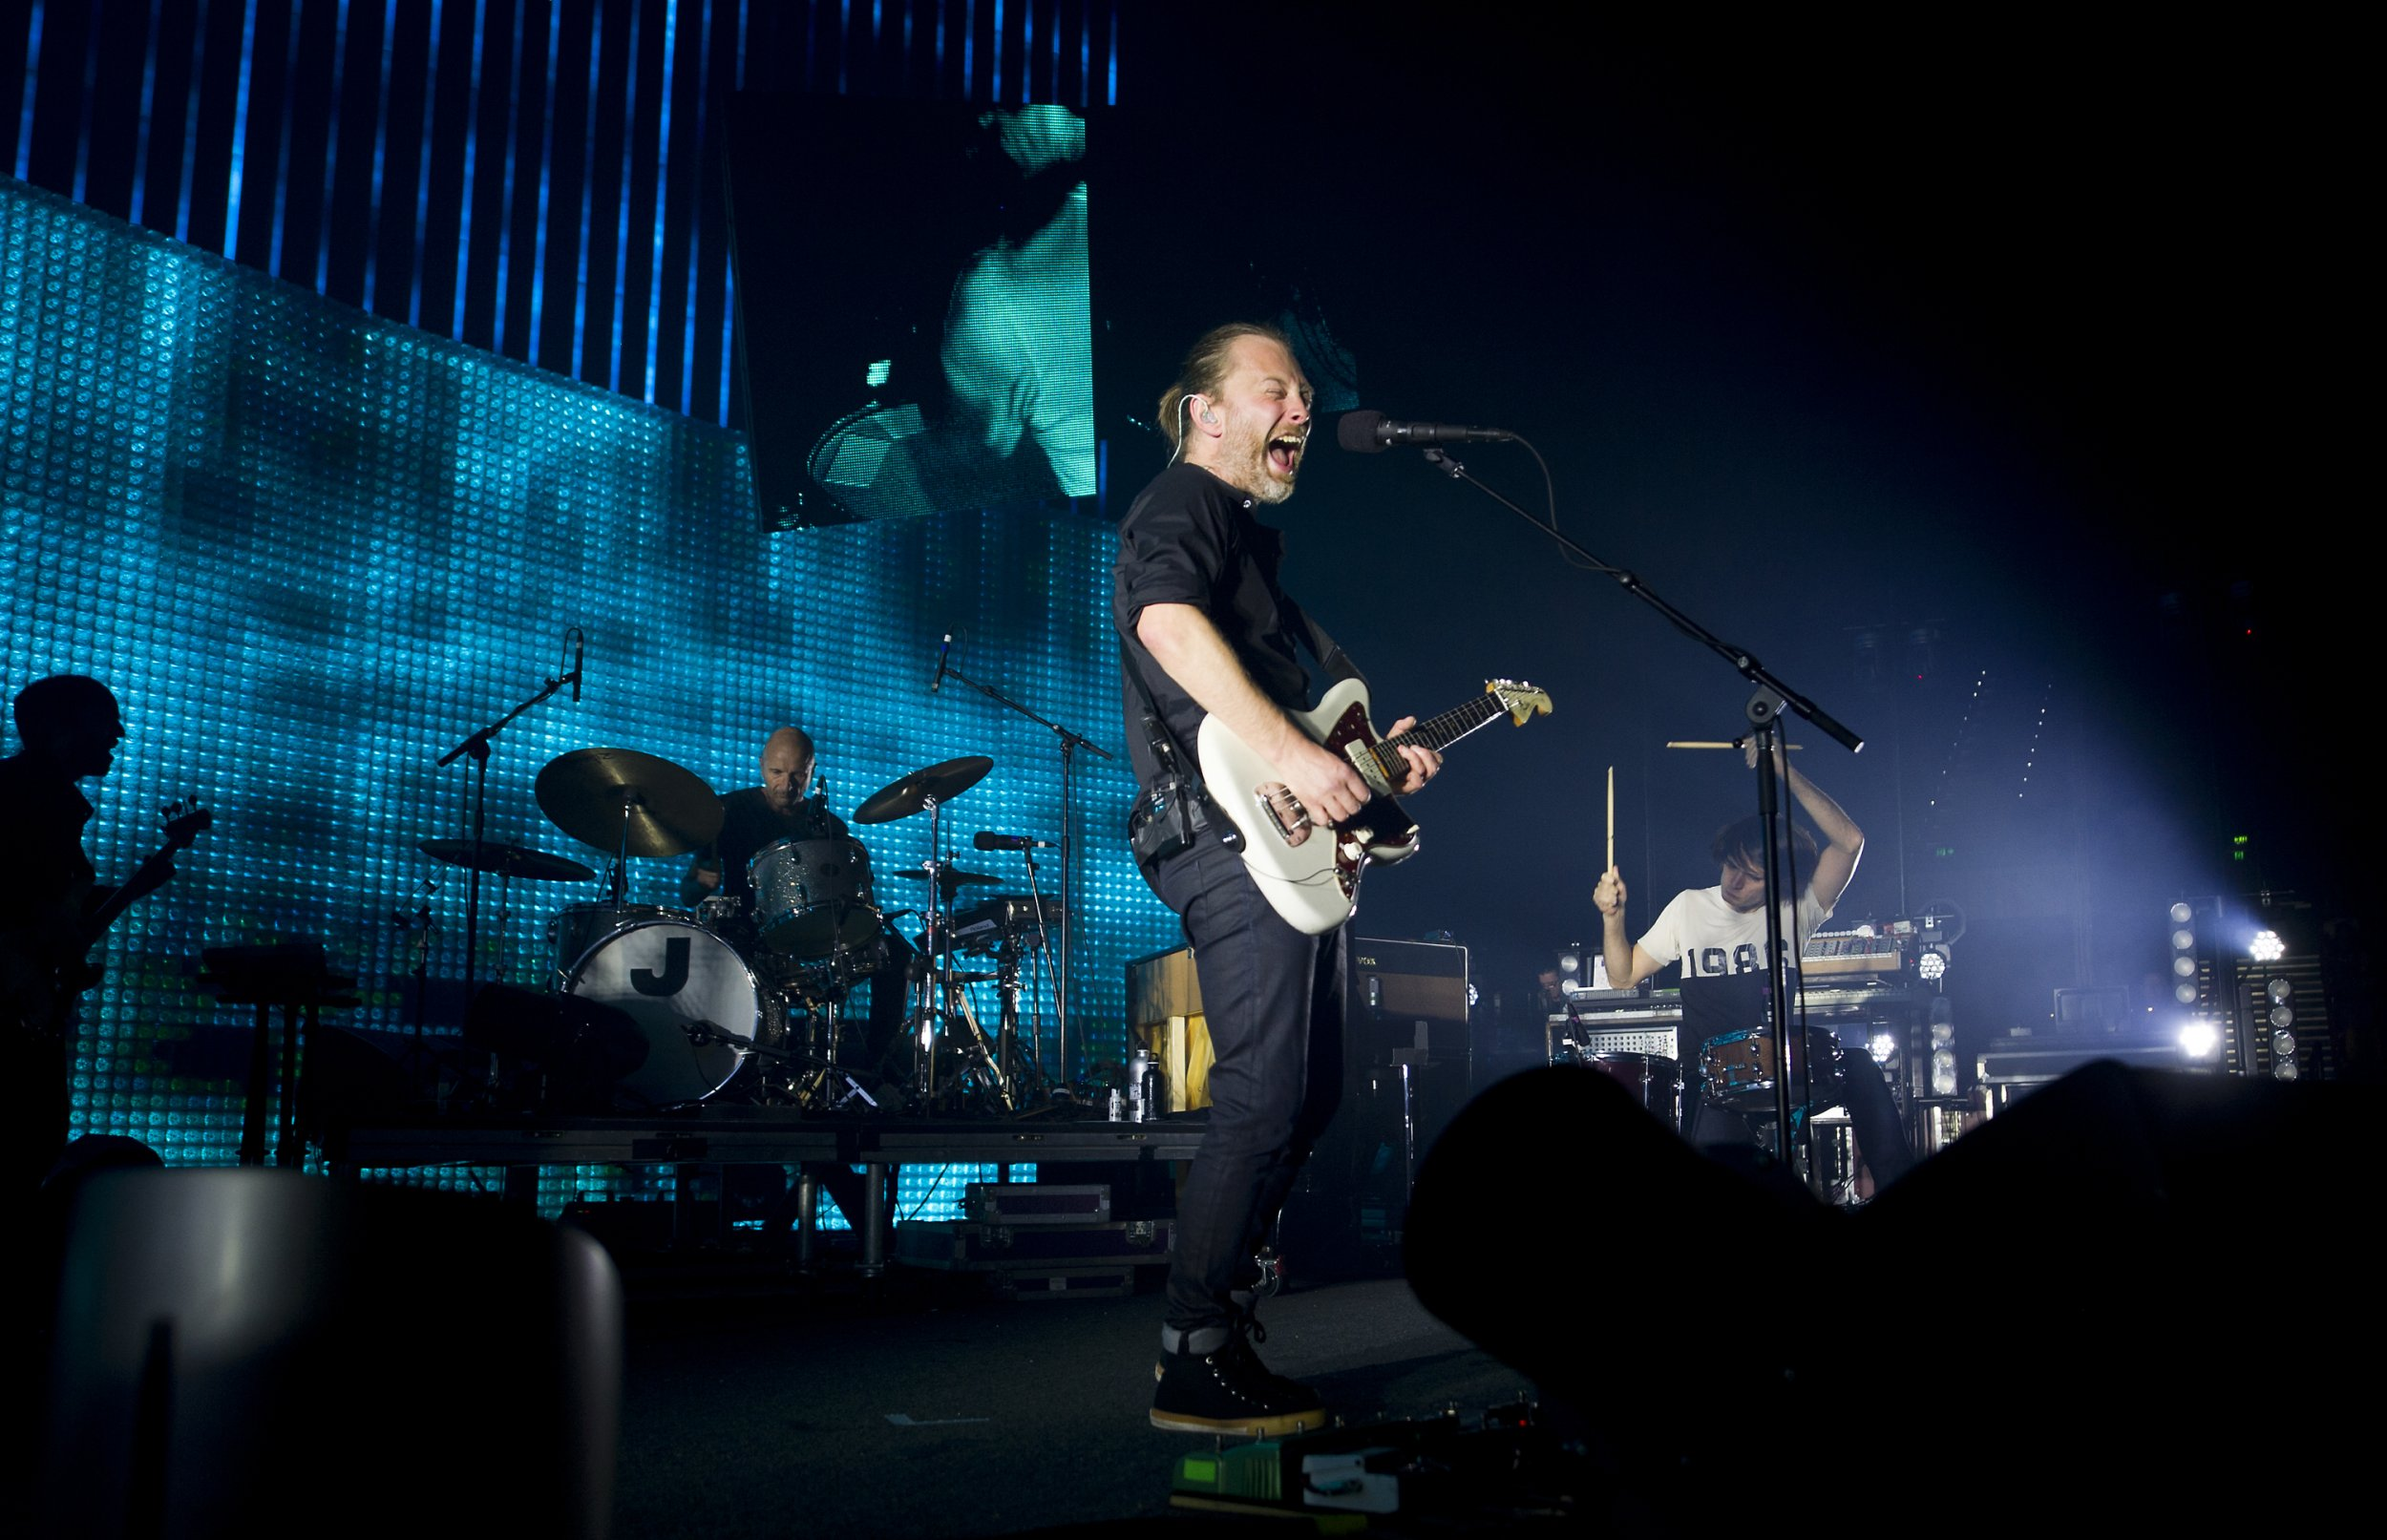 Radiohead Thom Yorke perform in Australia